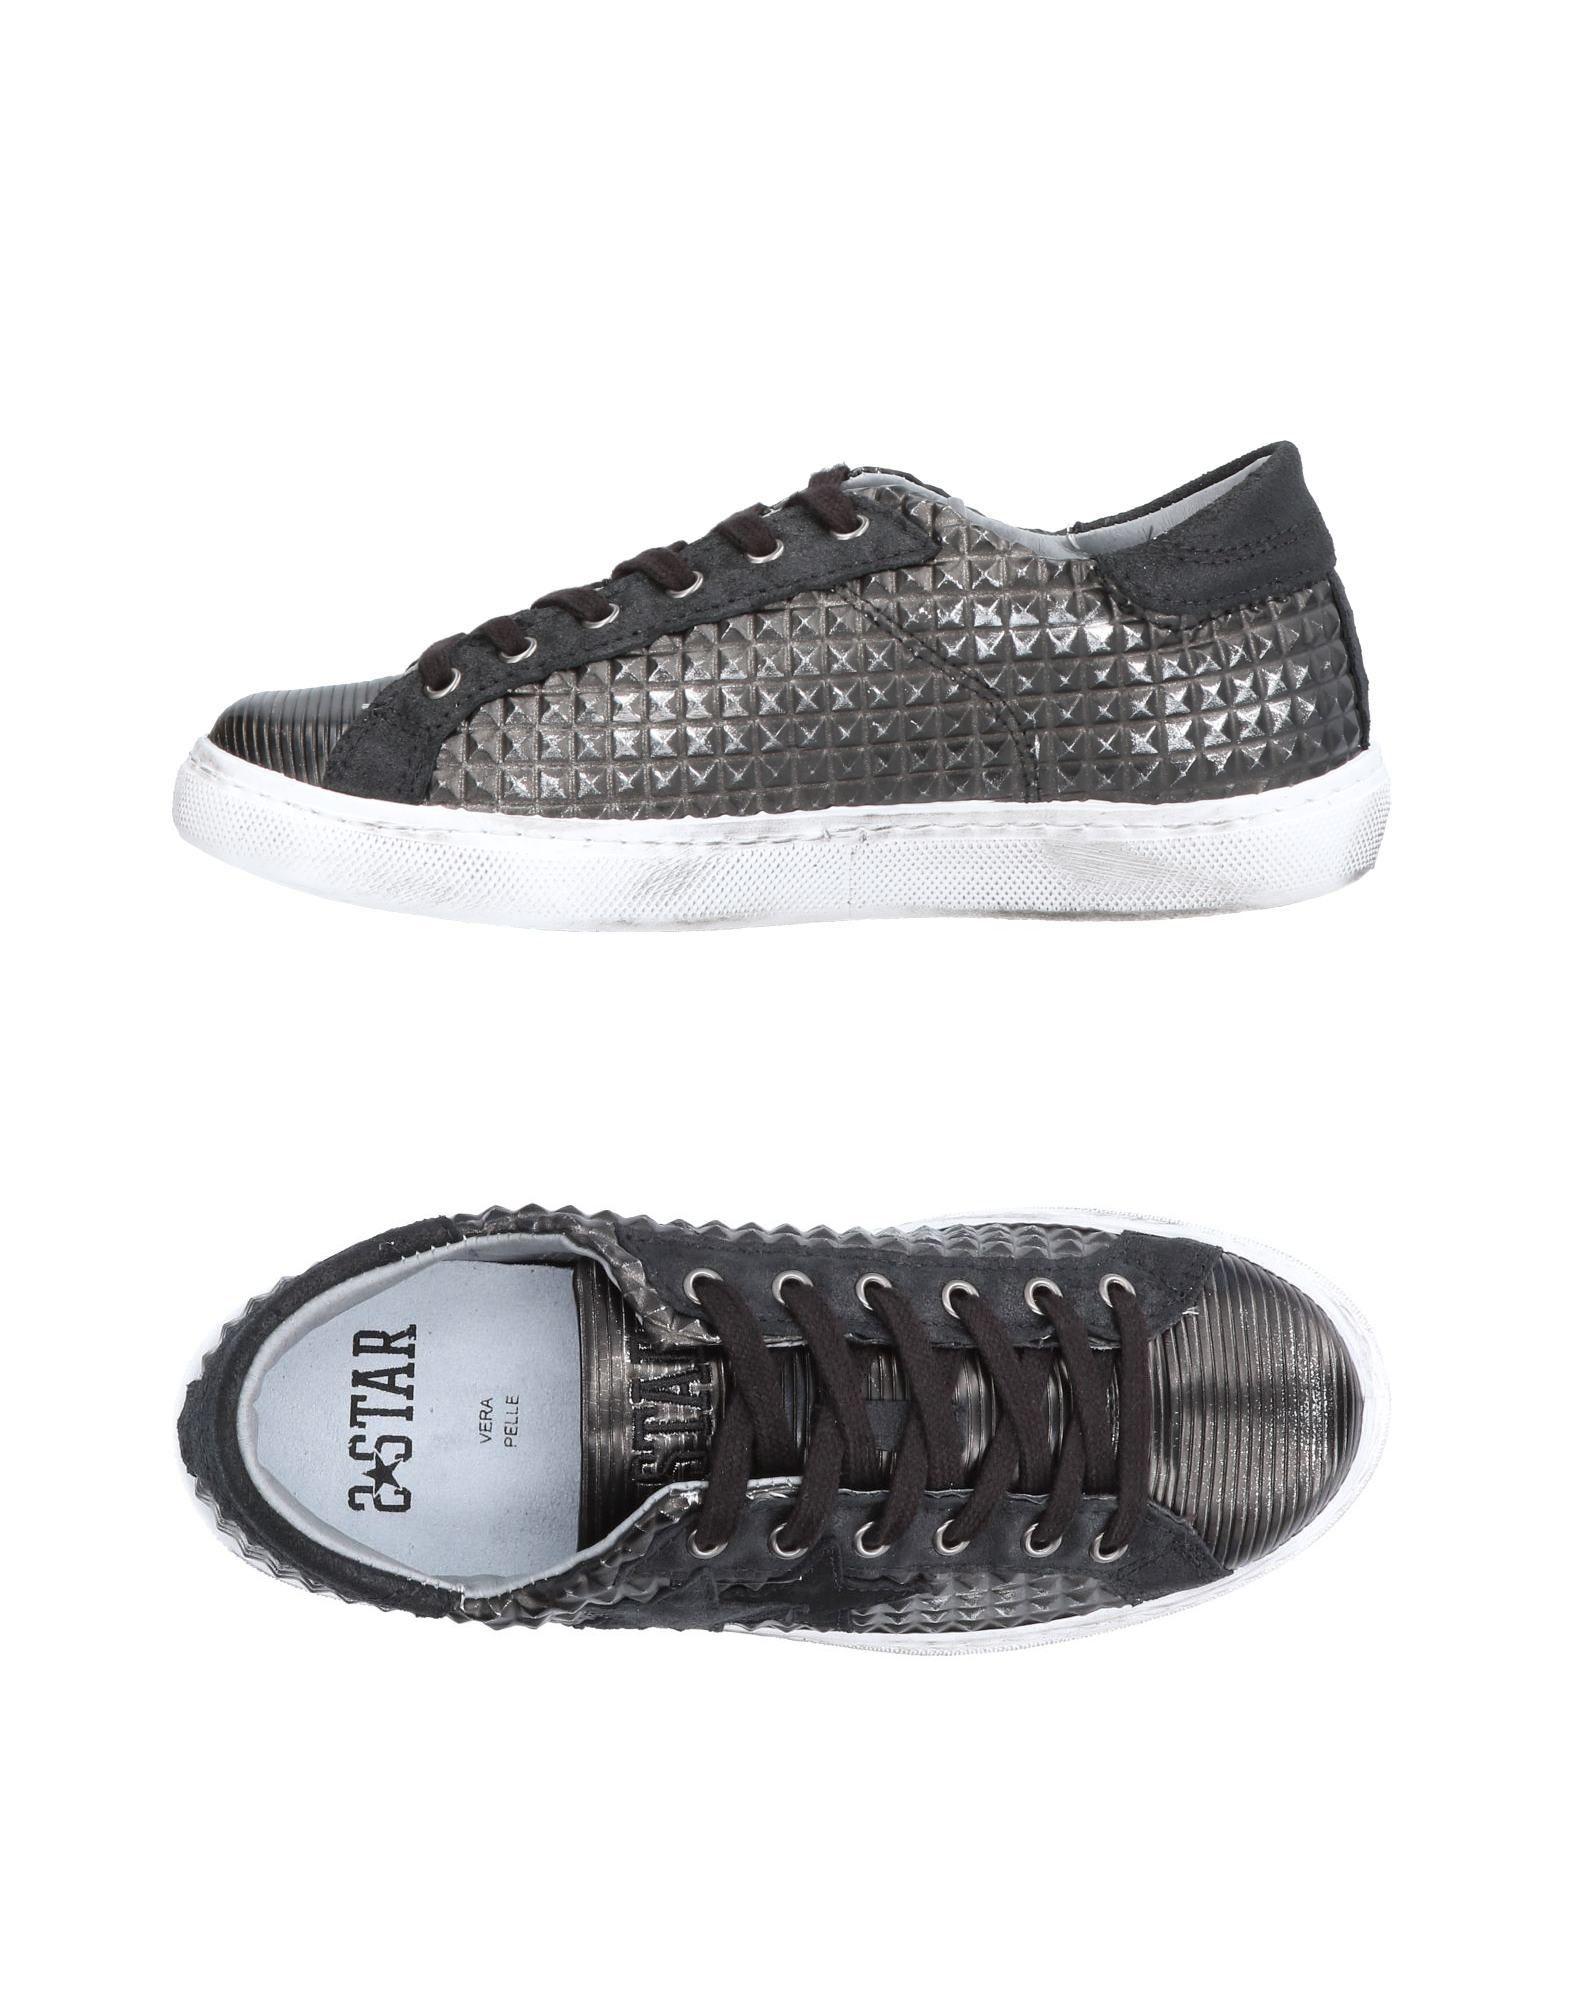 Moda Donna Sneakers 2Star Donna Moda - 11453556EX 5ee04b